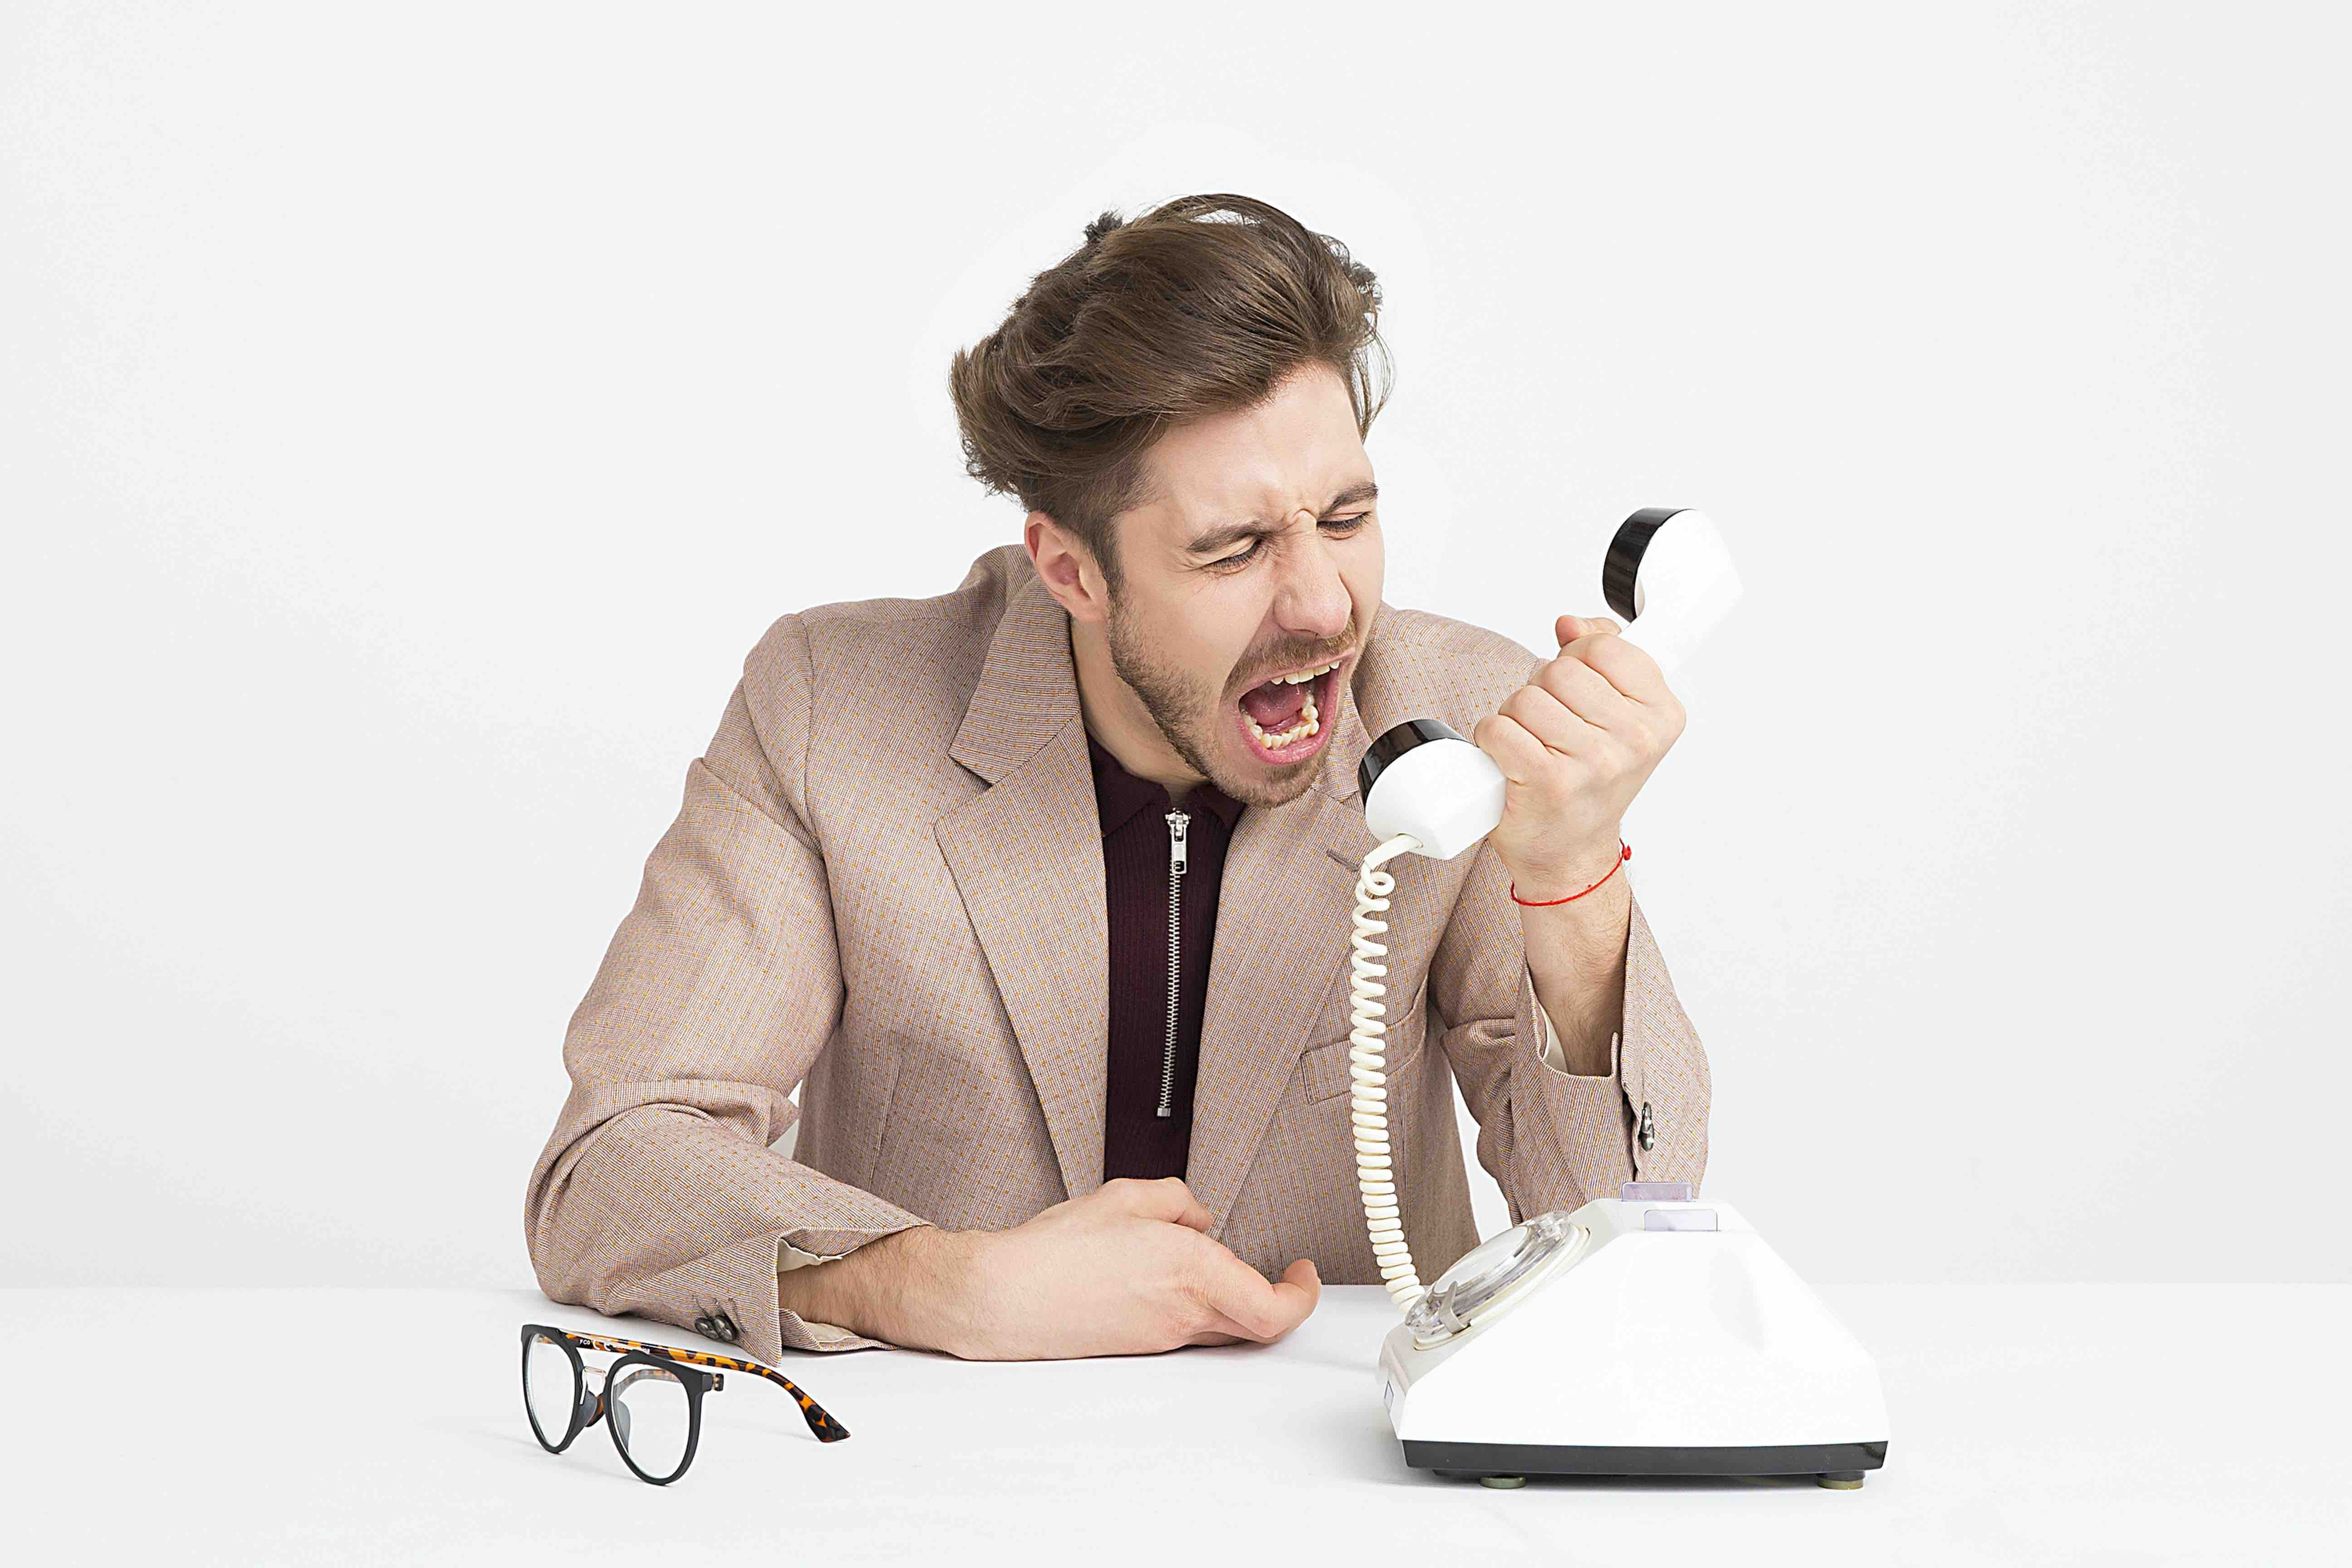 Employee yelling through the phone